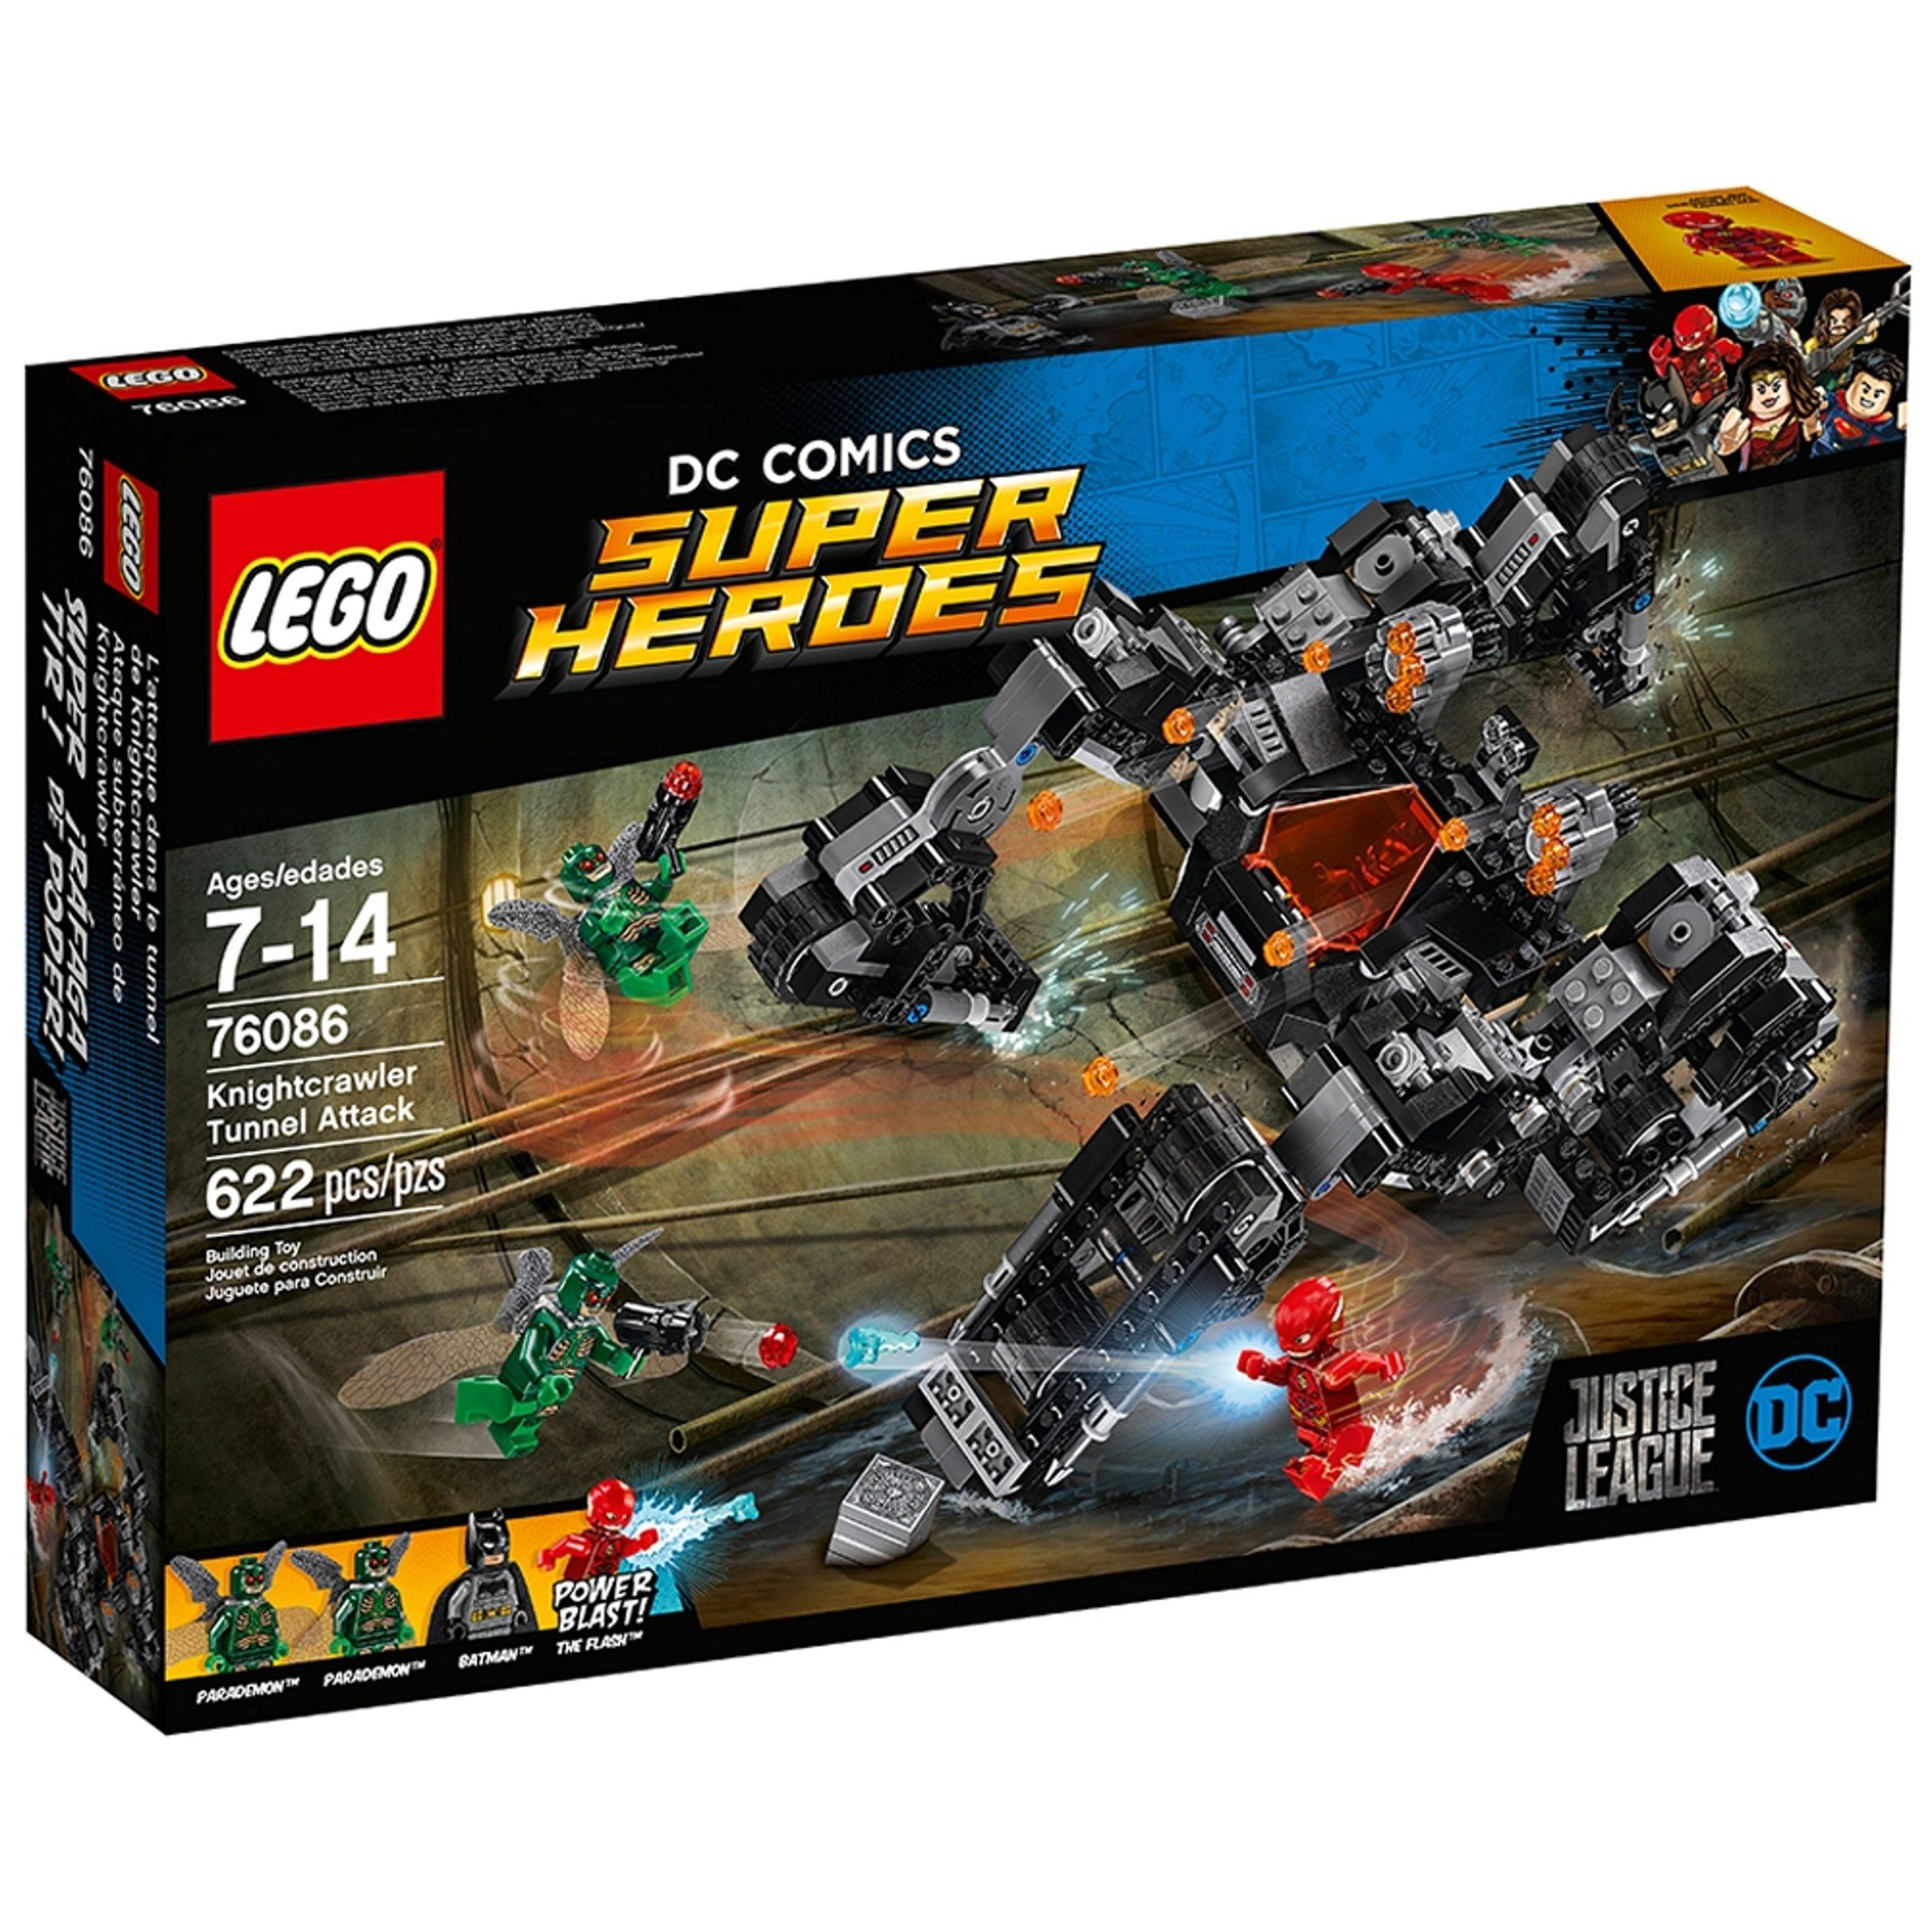 lego 76086 knightcrawler tunnel attack scaled